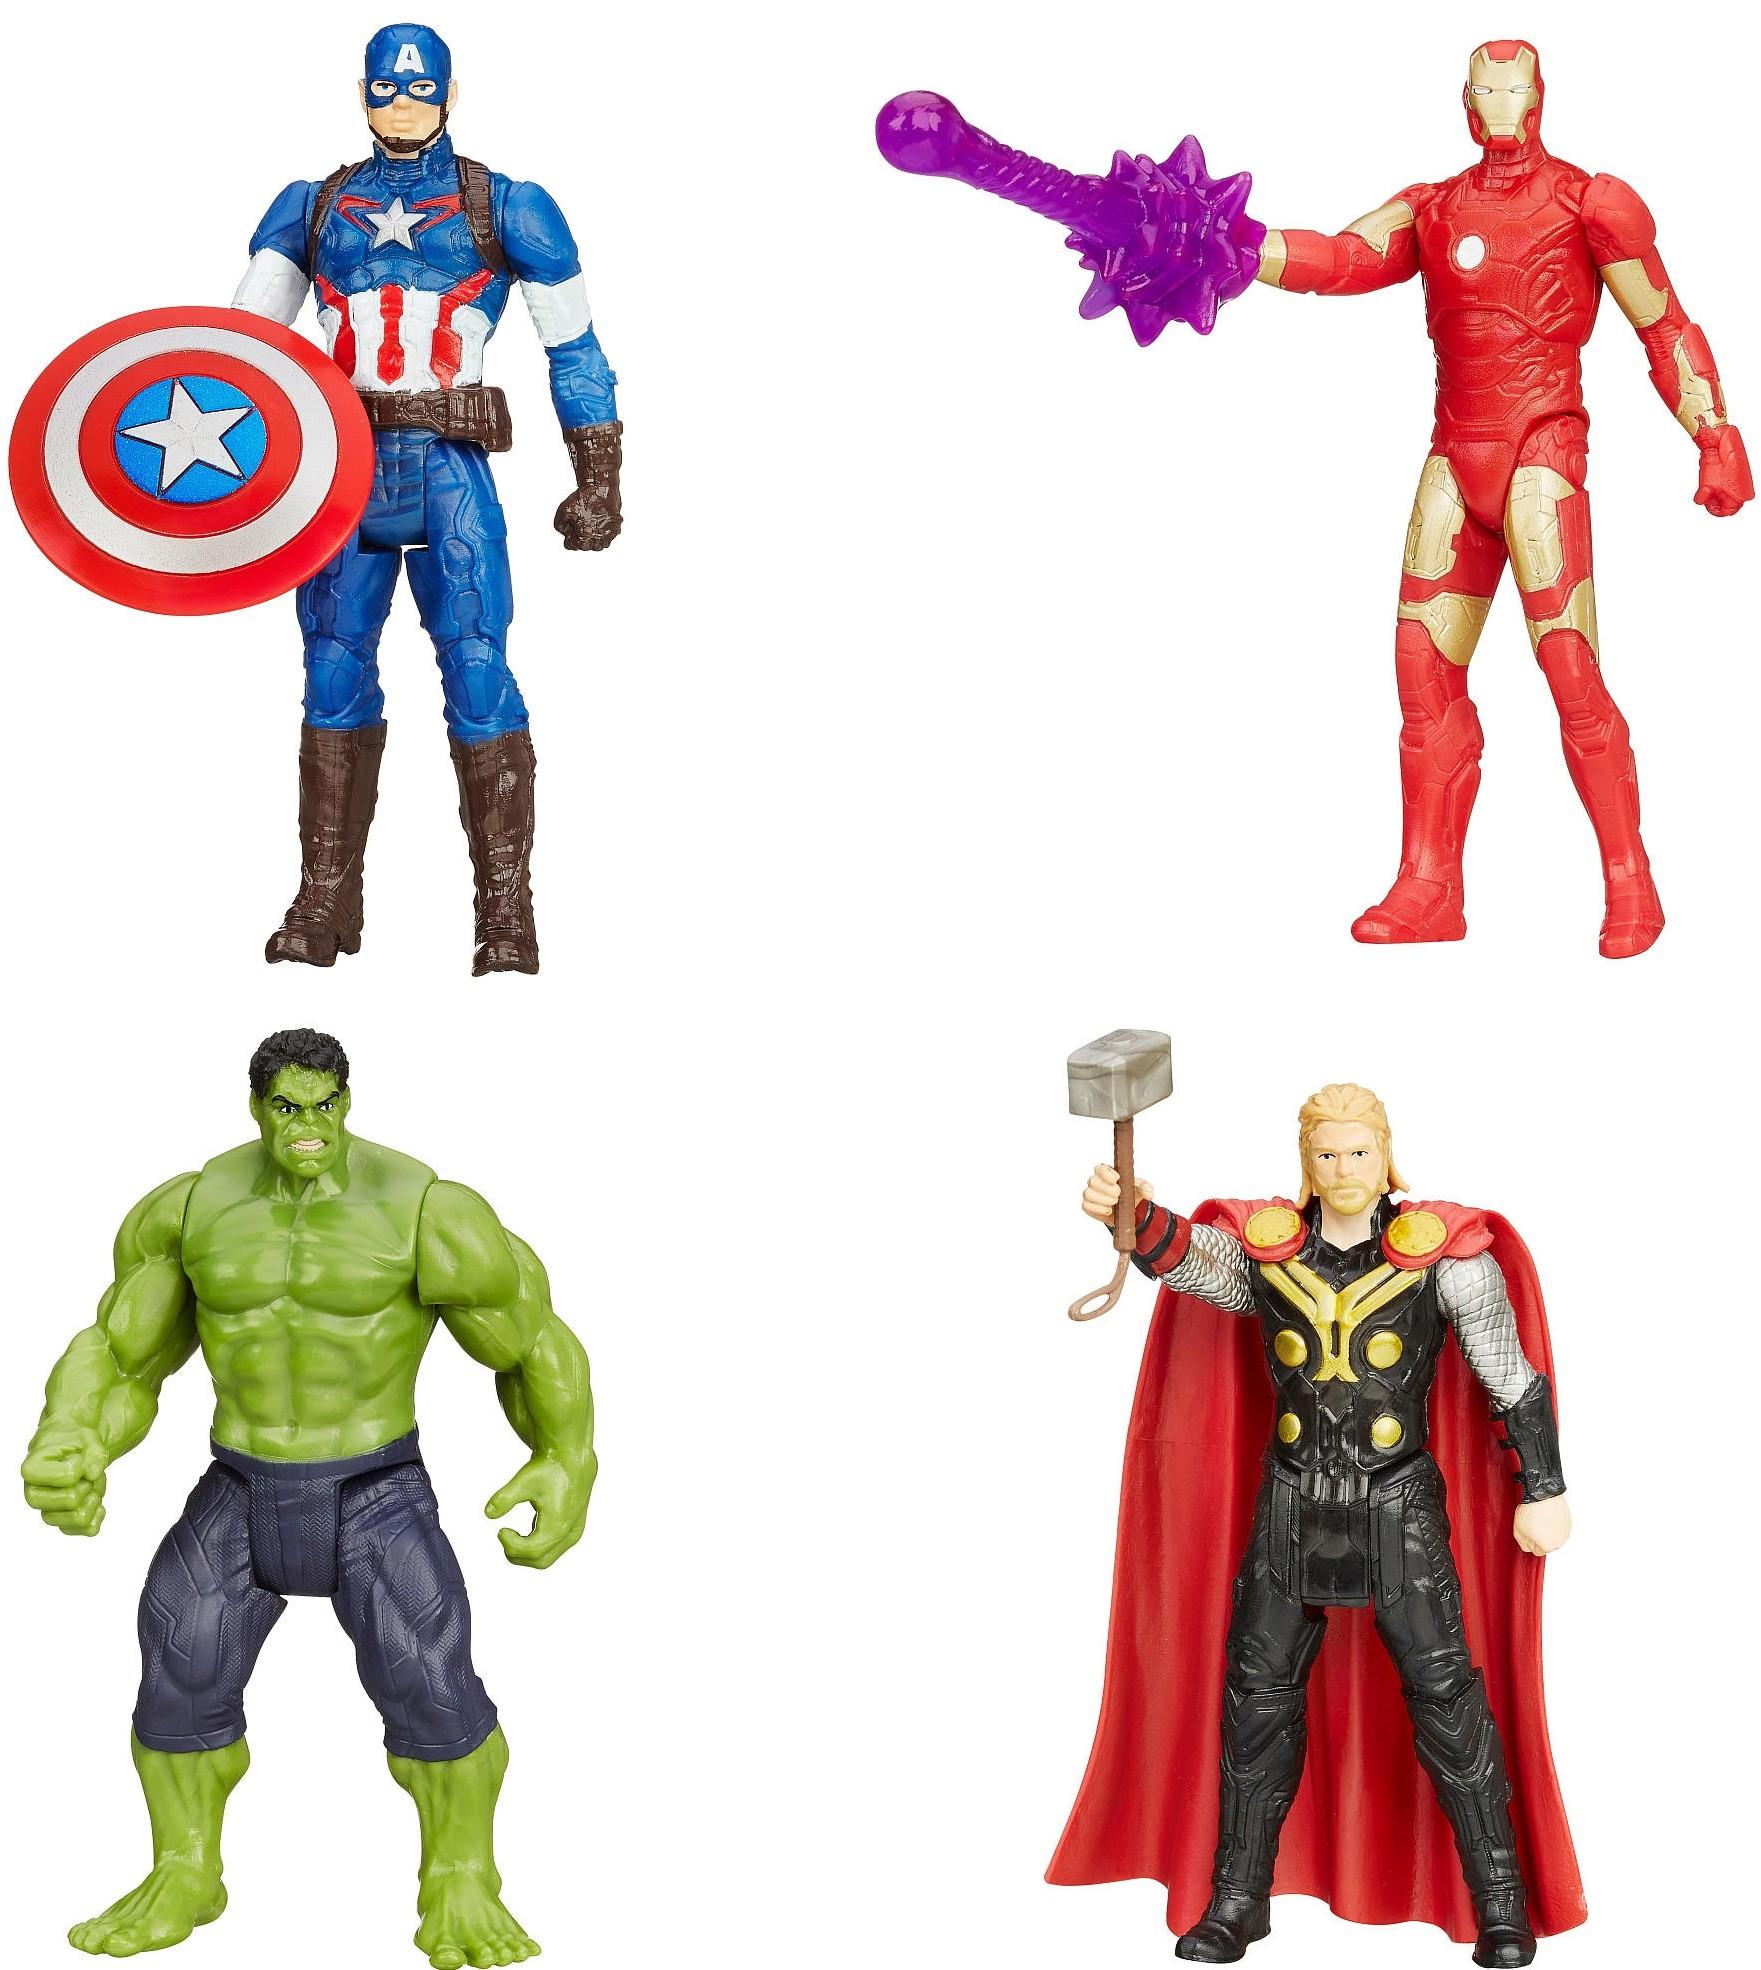 Avengers Avengers Мстители. Эра Альтрона 9.5 см avengers игрушка халк титан